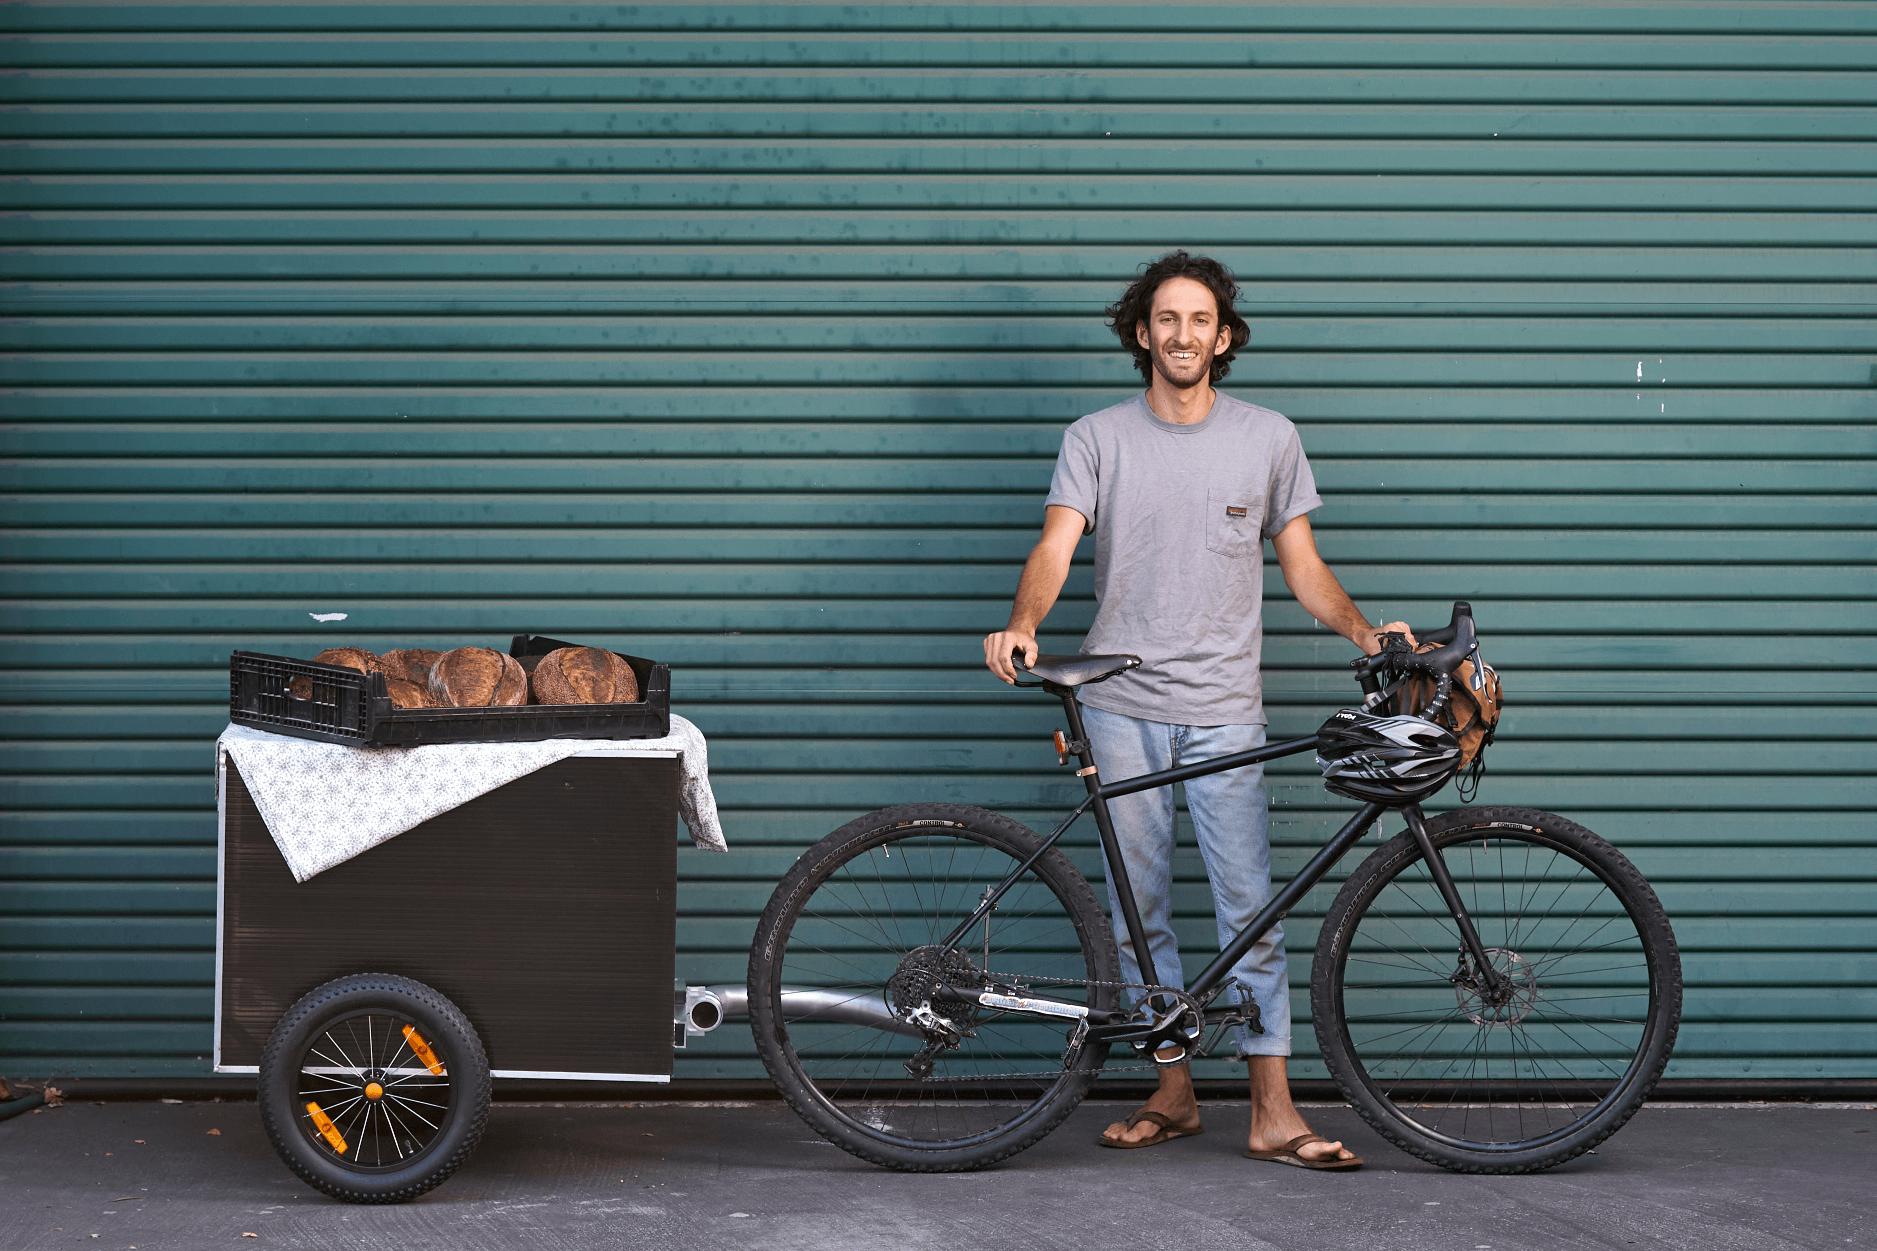 Sam with Bread Bike